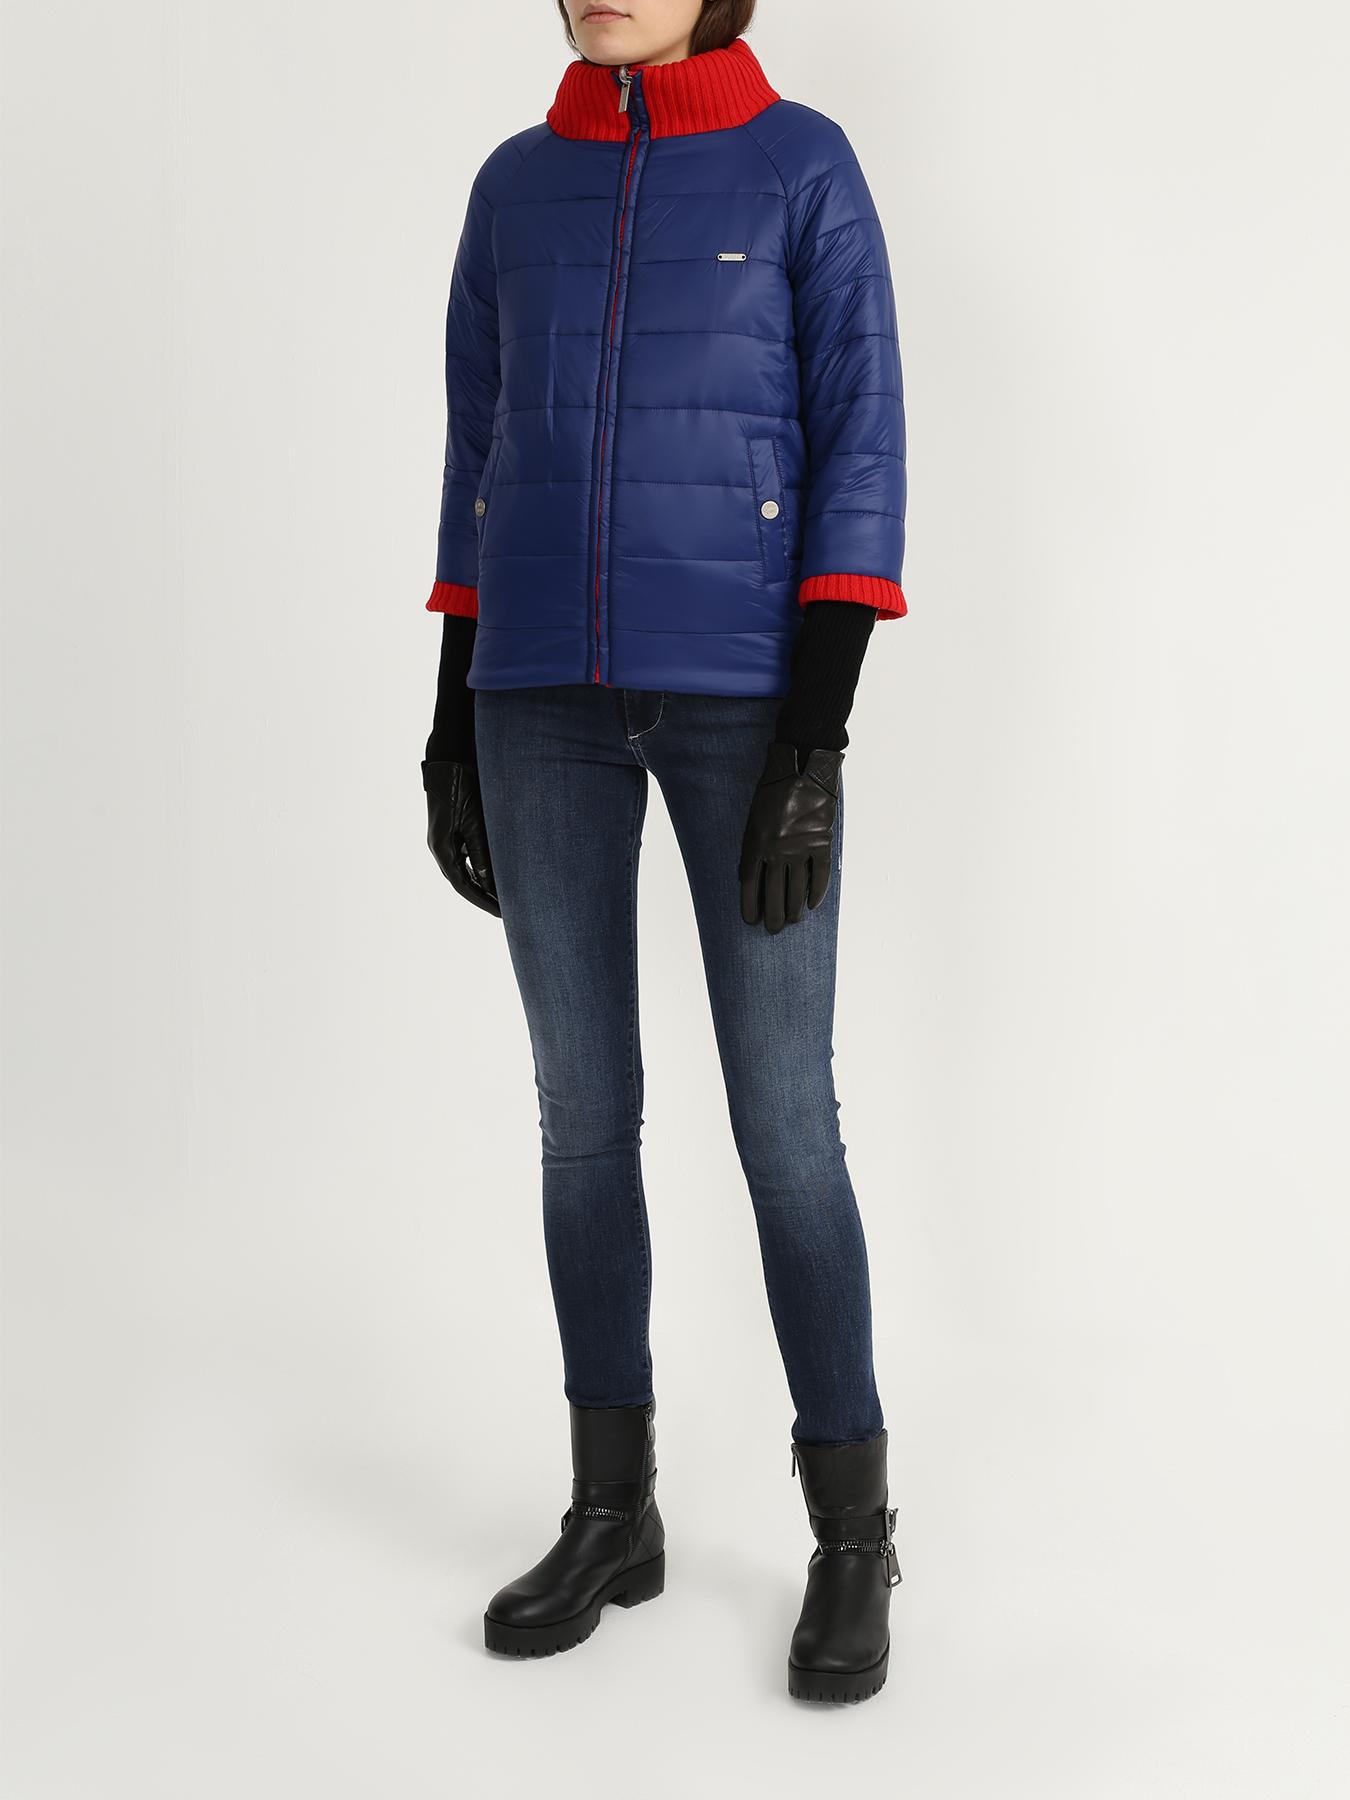 Korpo Two Двусторонняя куртка от Korpo Two